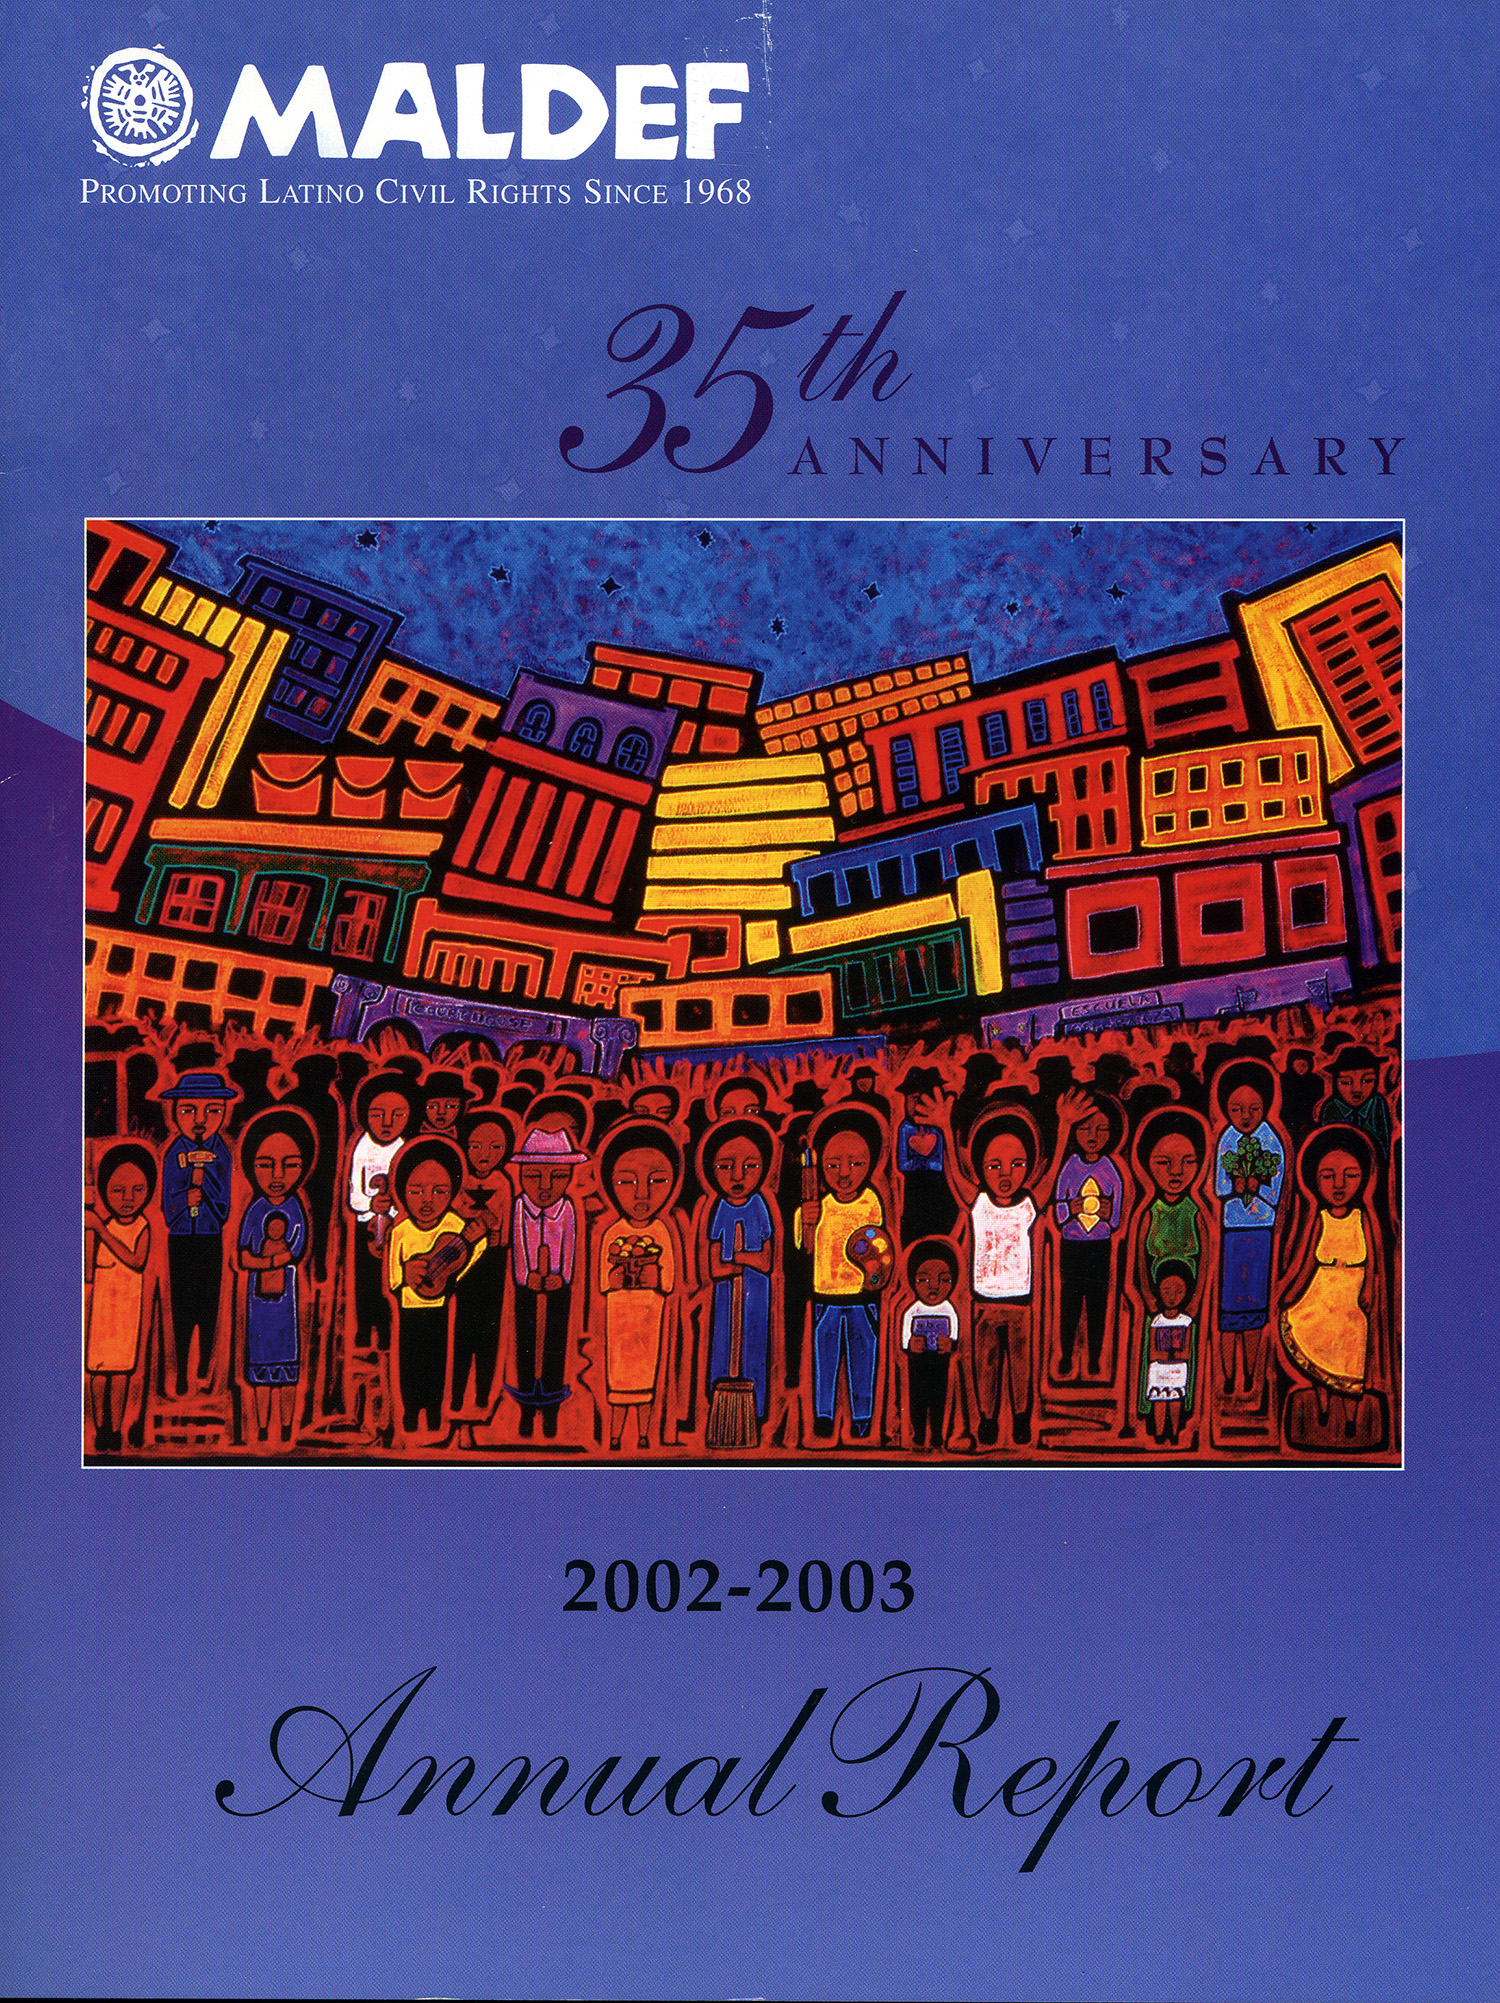 35th anniversary commission, MALDEF, 2003.